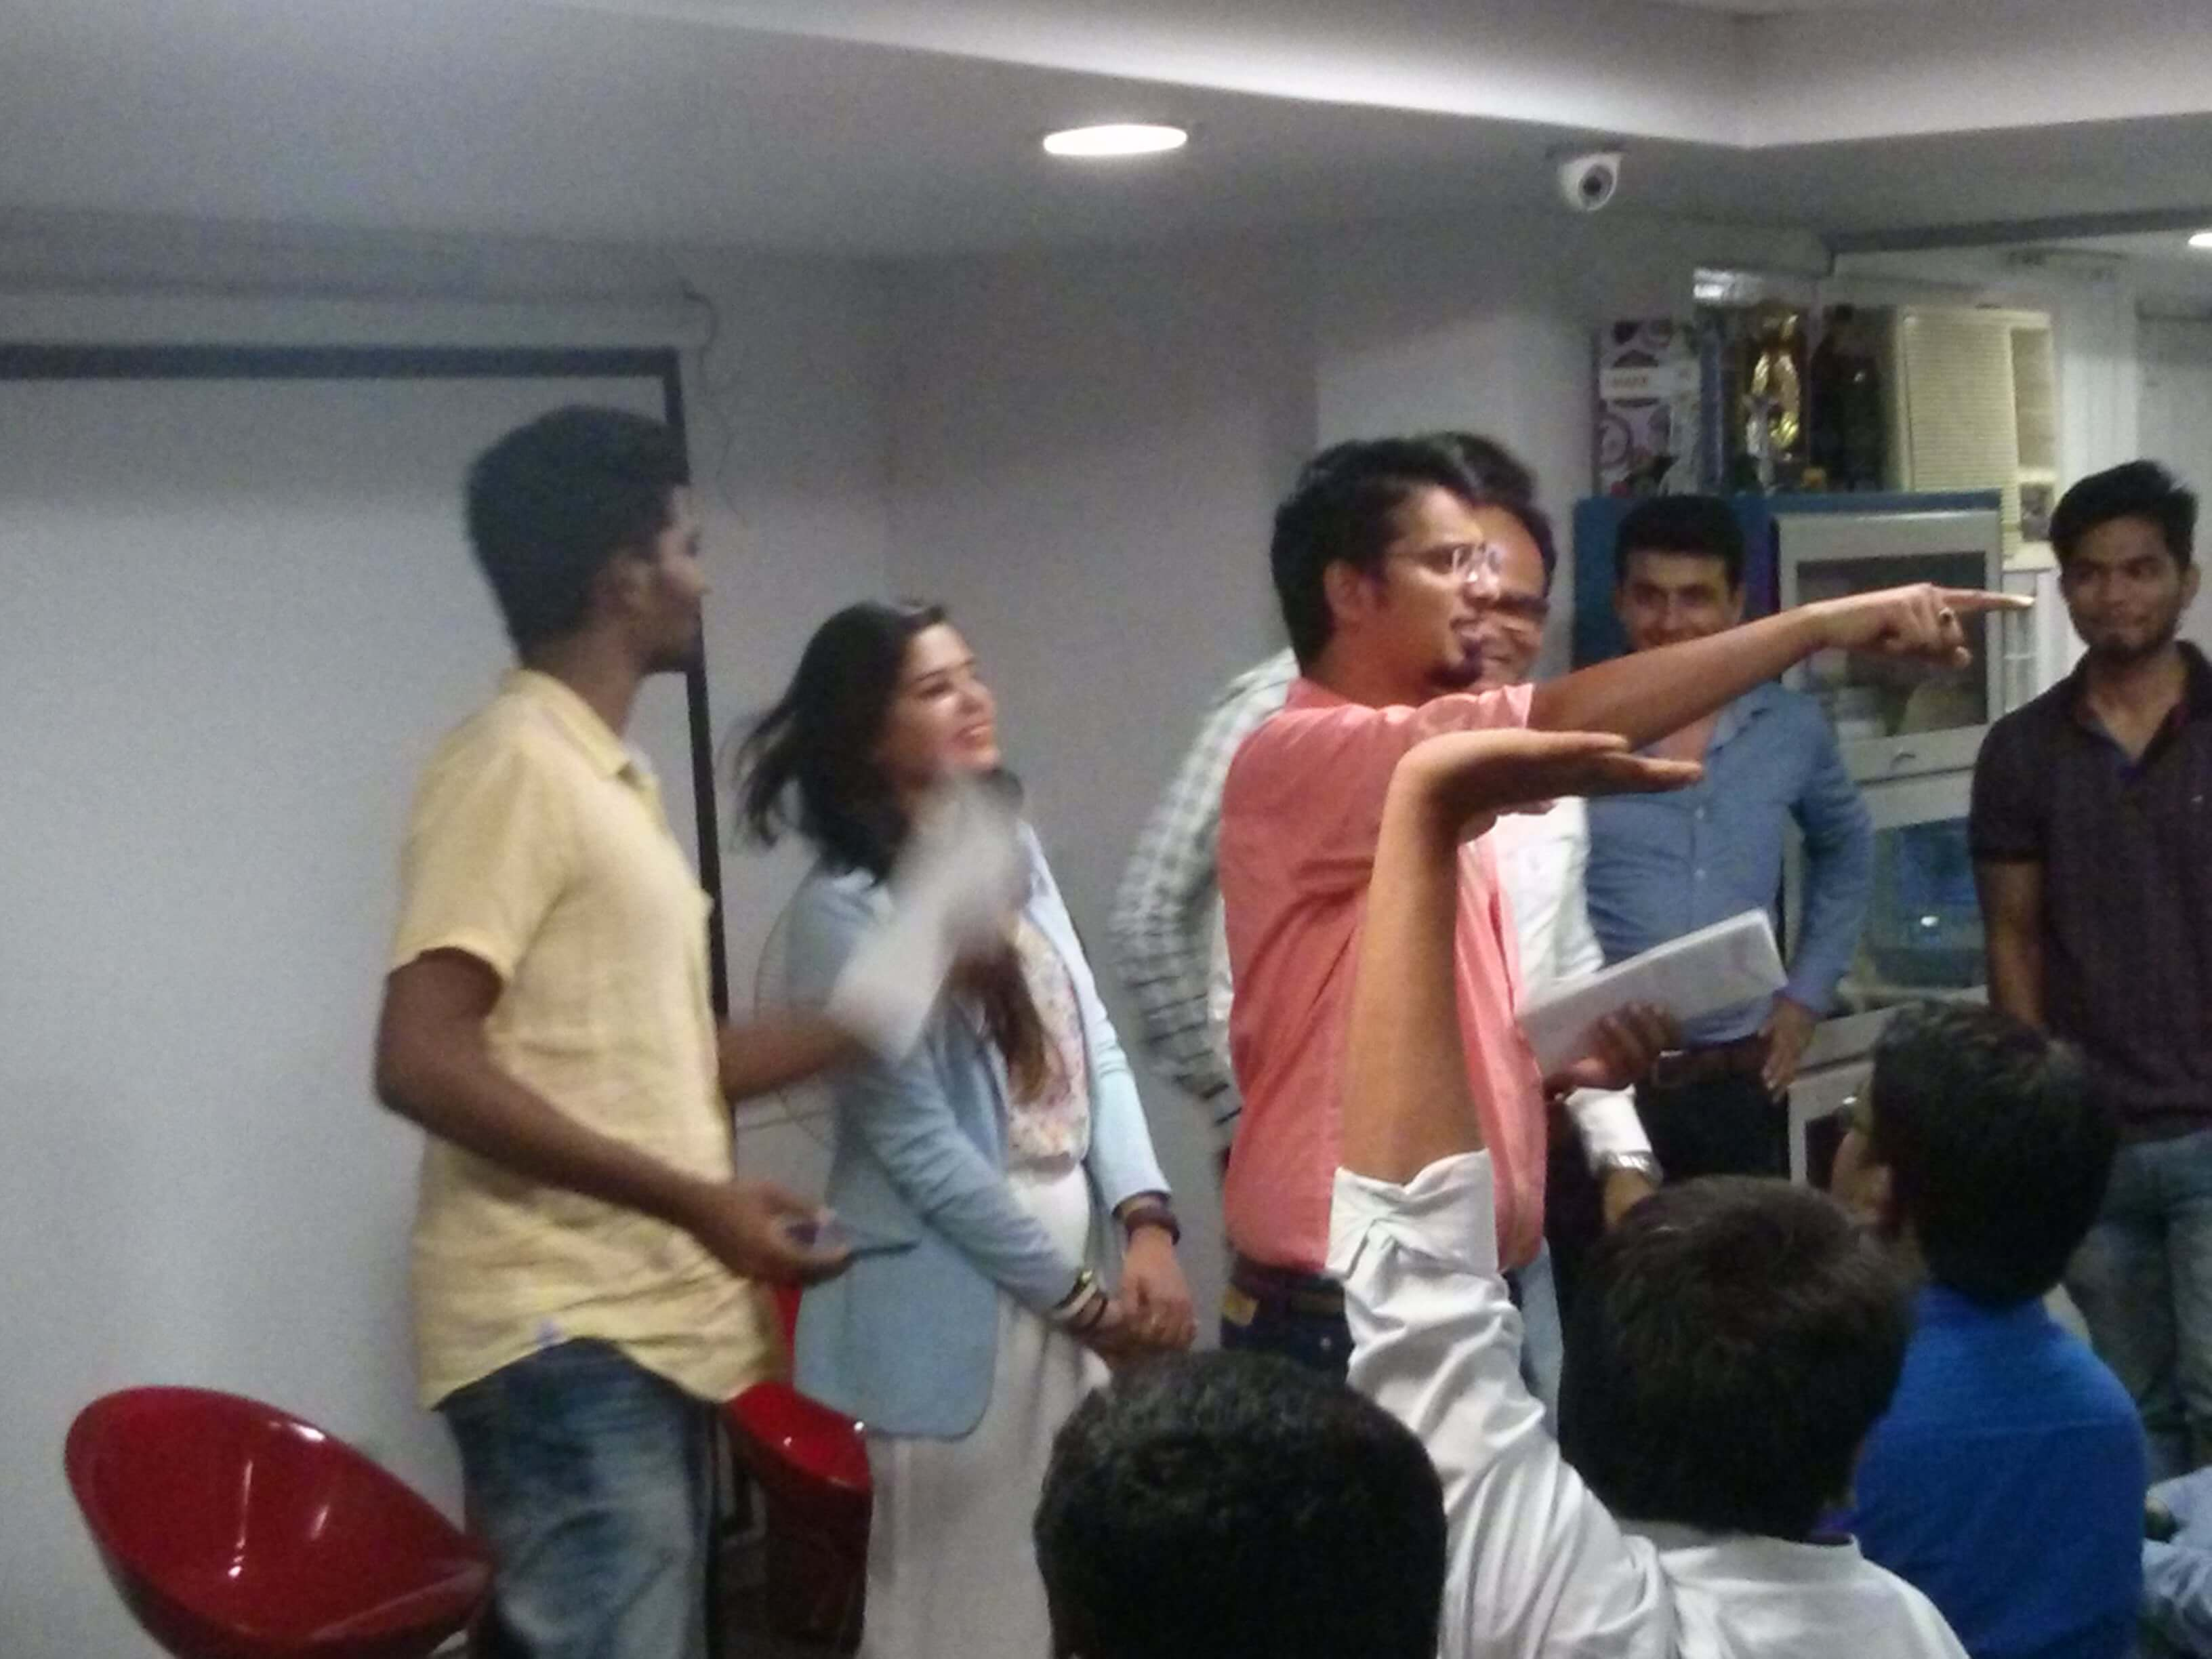 ShoutMeet Hyderabad